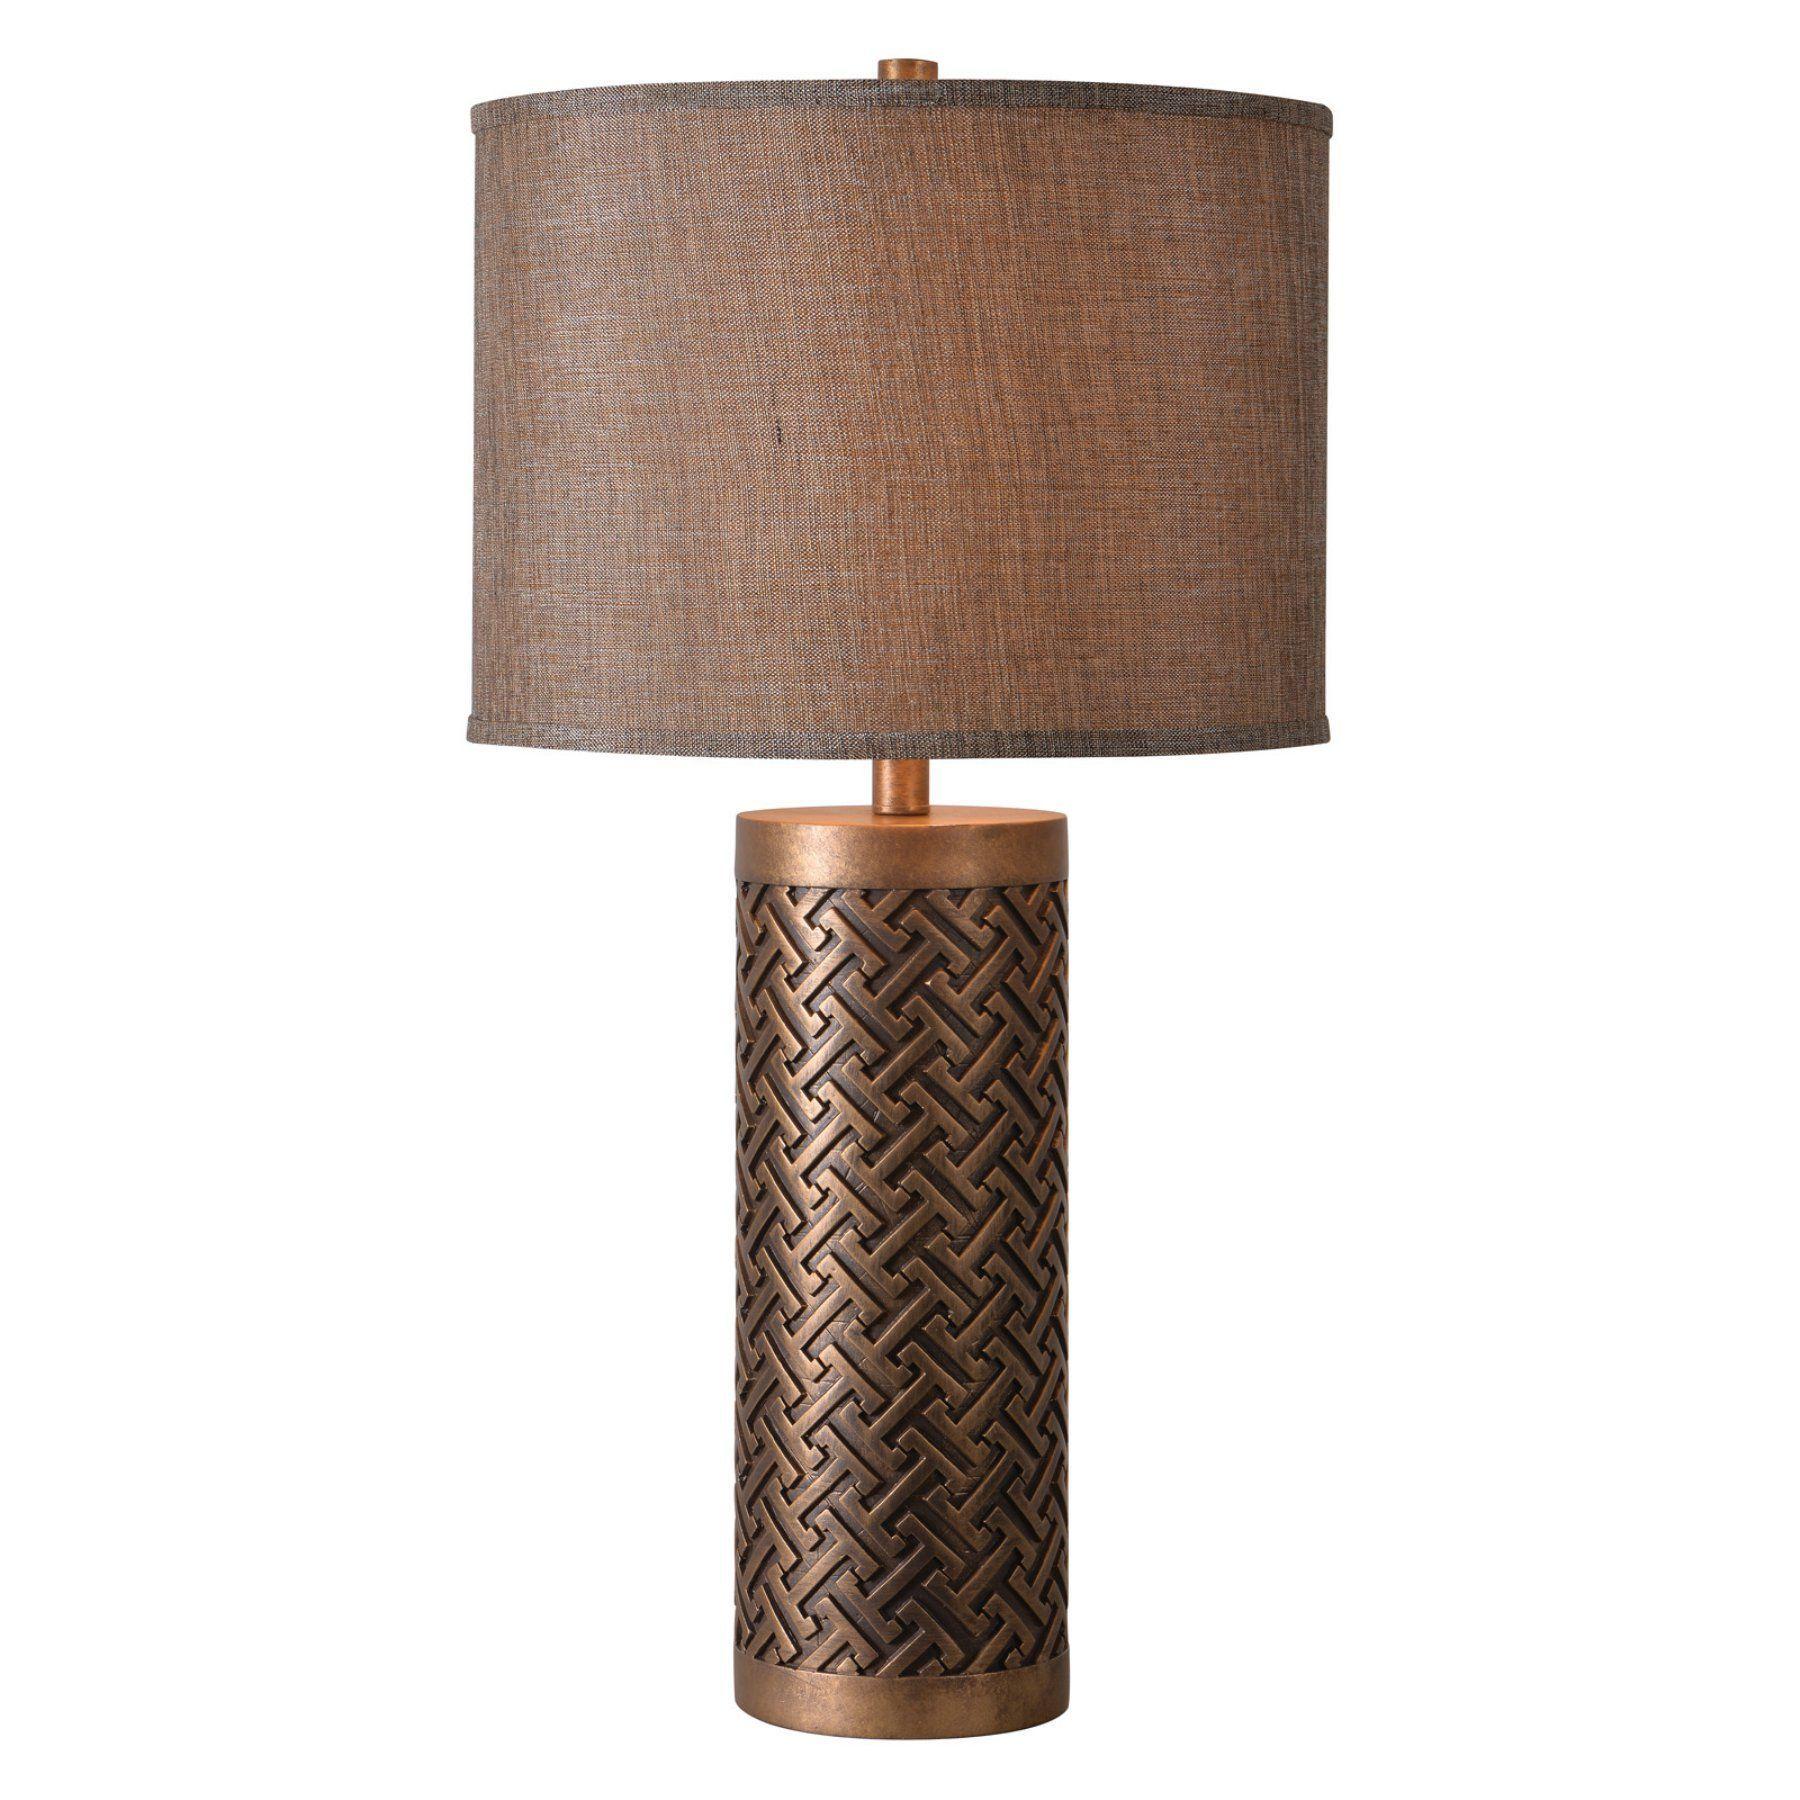 Kenroy Home Gravure Table Lamp 32825gld Table Lamp Lamp Kenroy Home